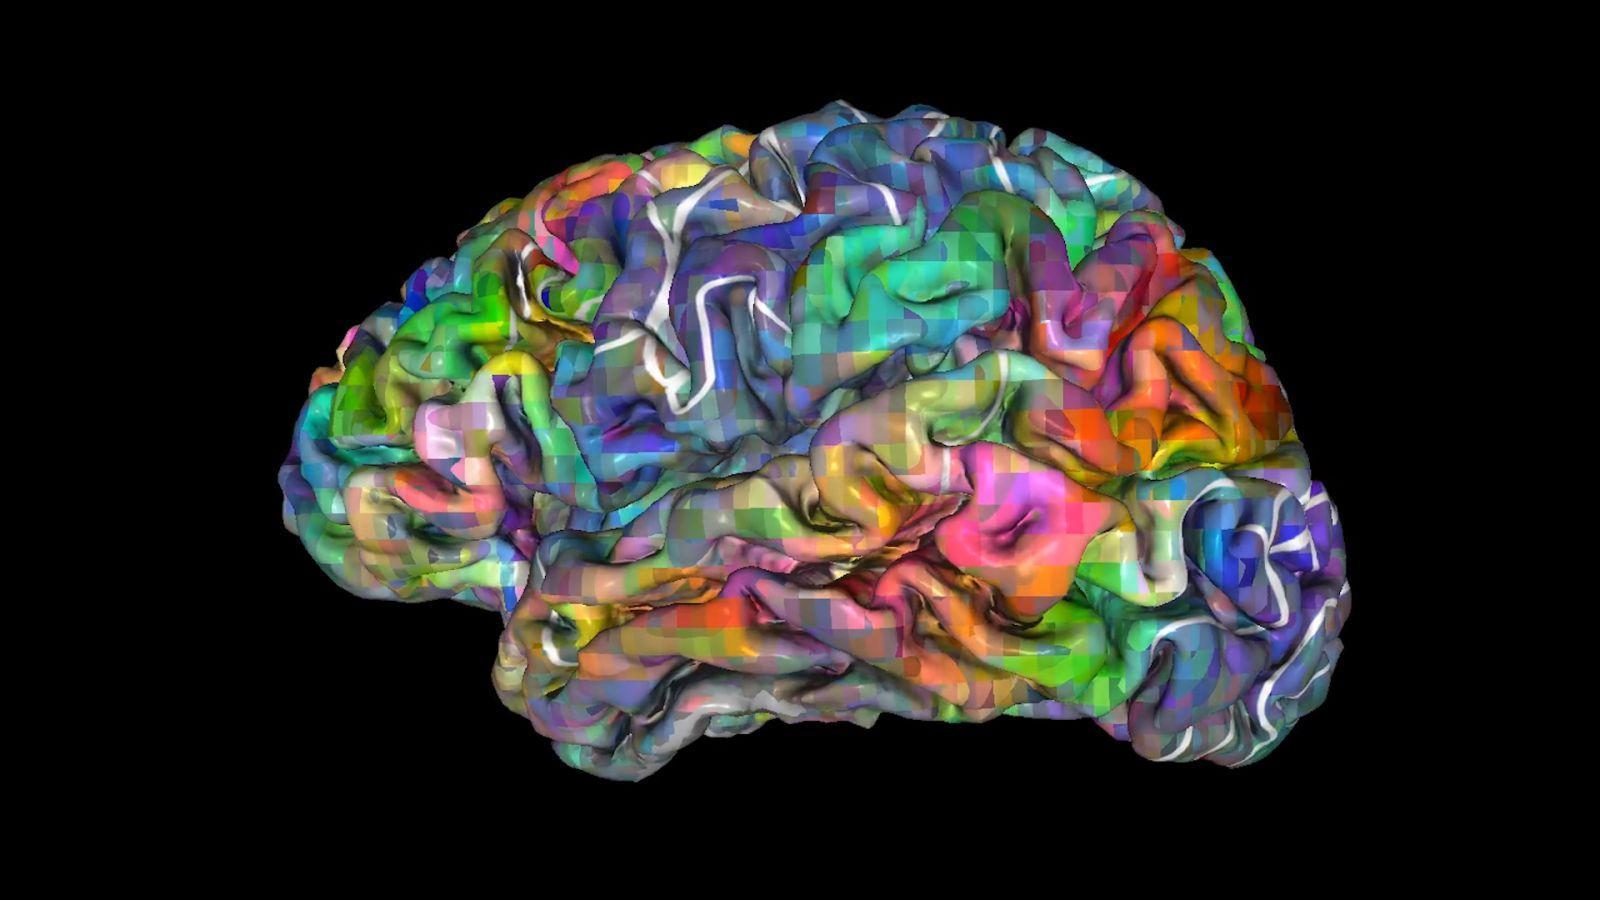 Neuroscientists can read brain activity